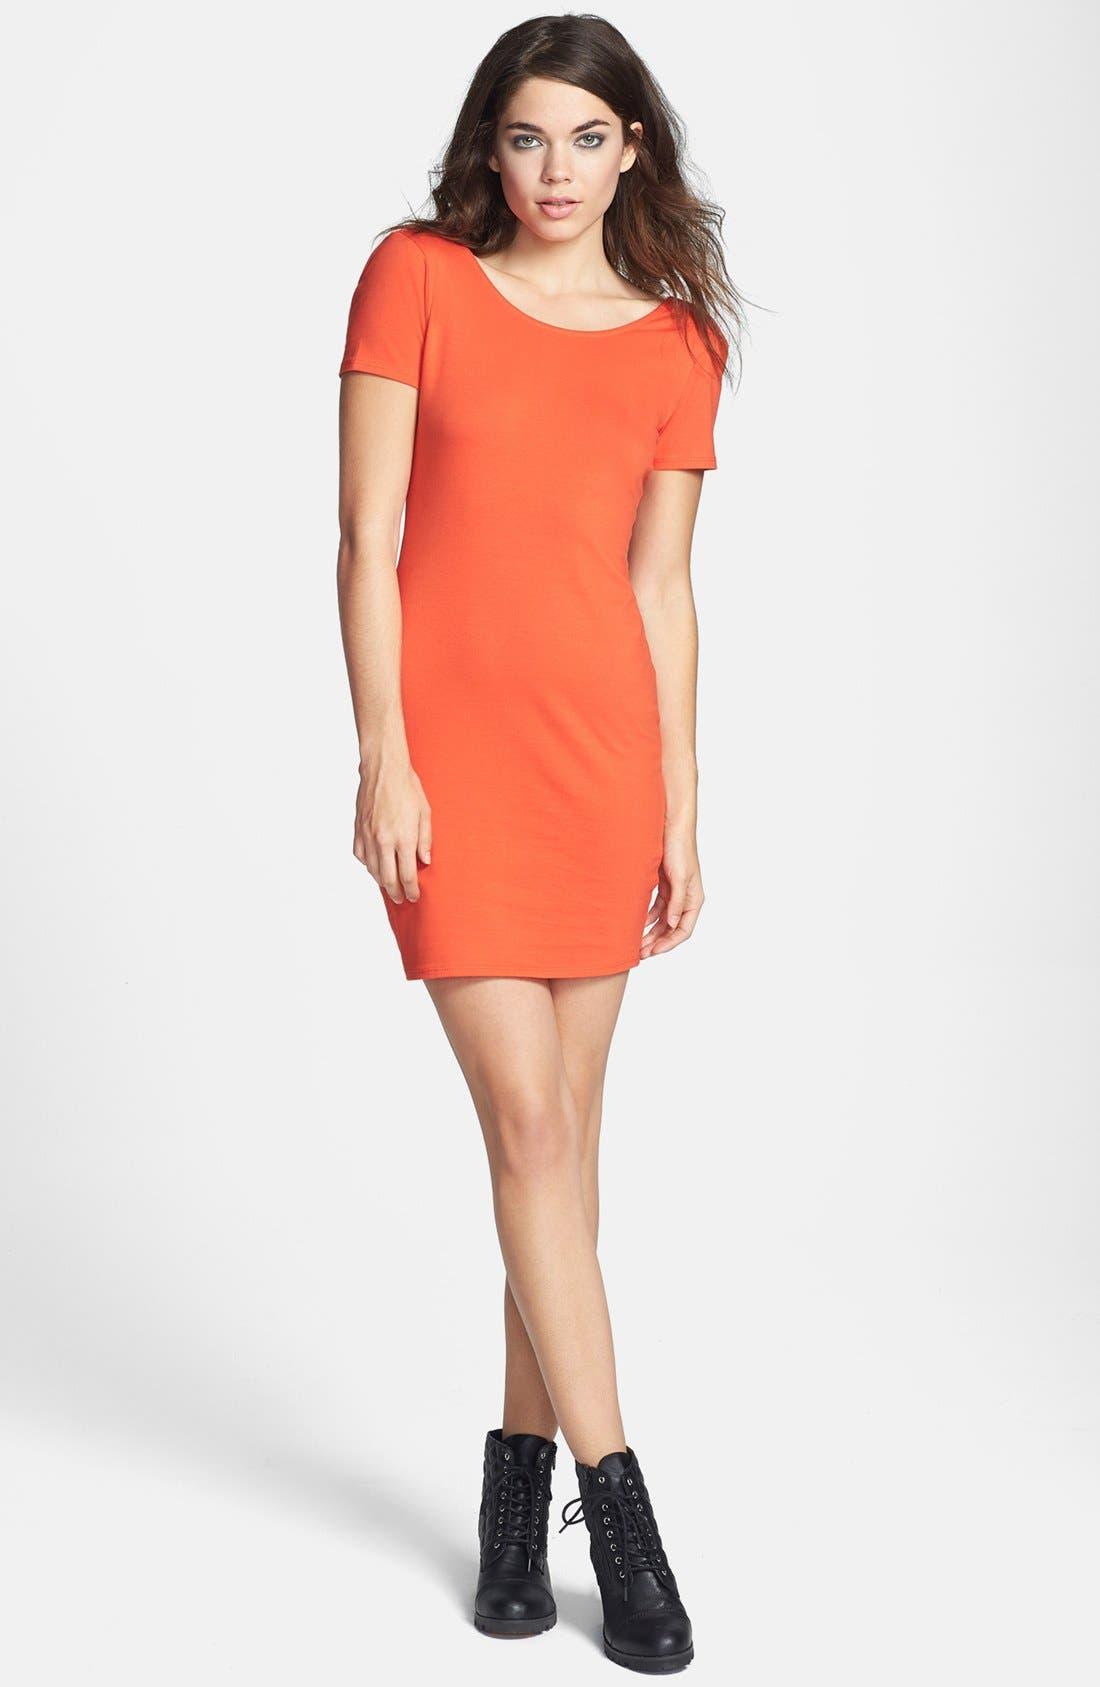 Alternate Image 1 Selected - Wayf Scoop Back Body-Con Dress